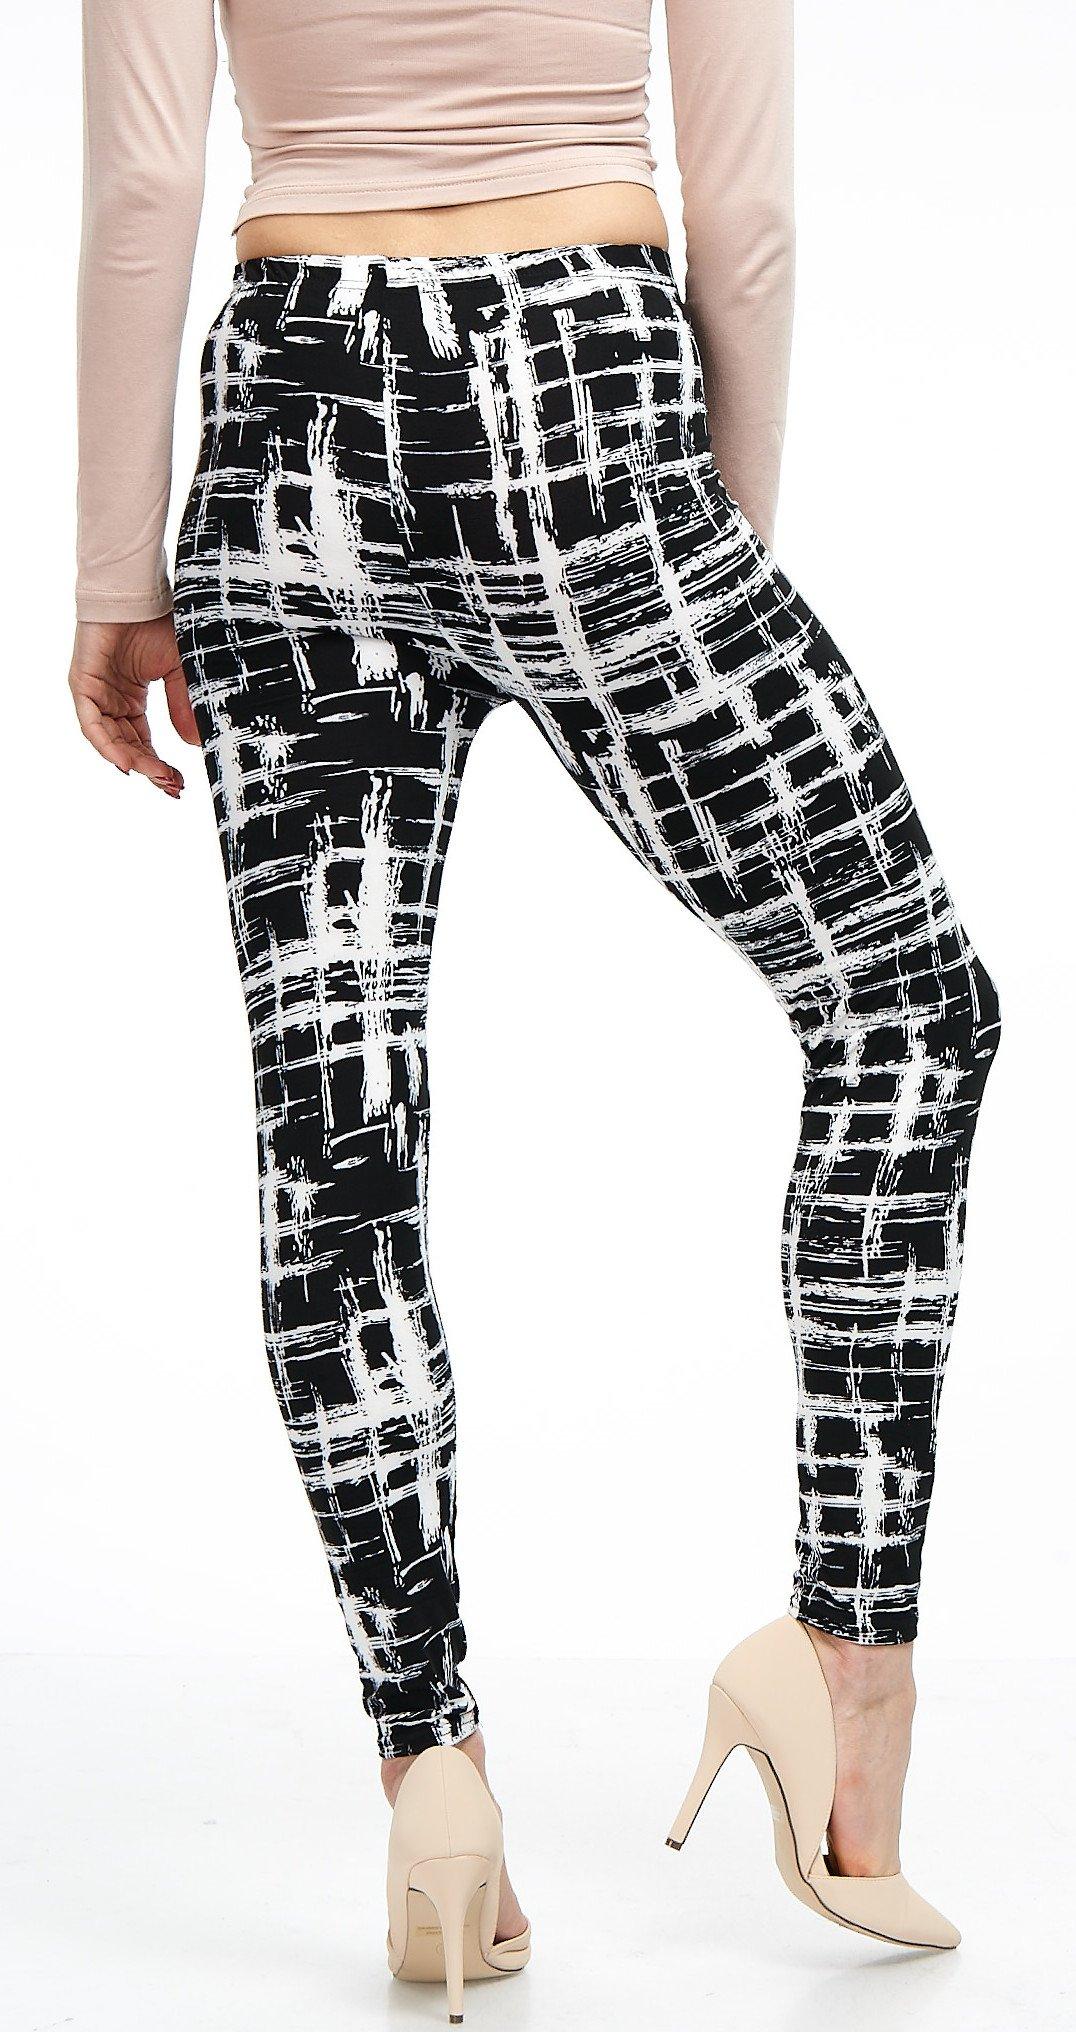 LMB Lush Moda Extra Soft Leggings with Designs- Variety of Prints - 720F Black White Stripes B5 by LMB (Image #8)